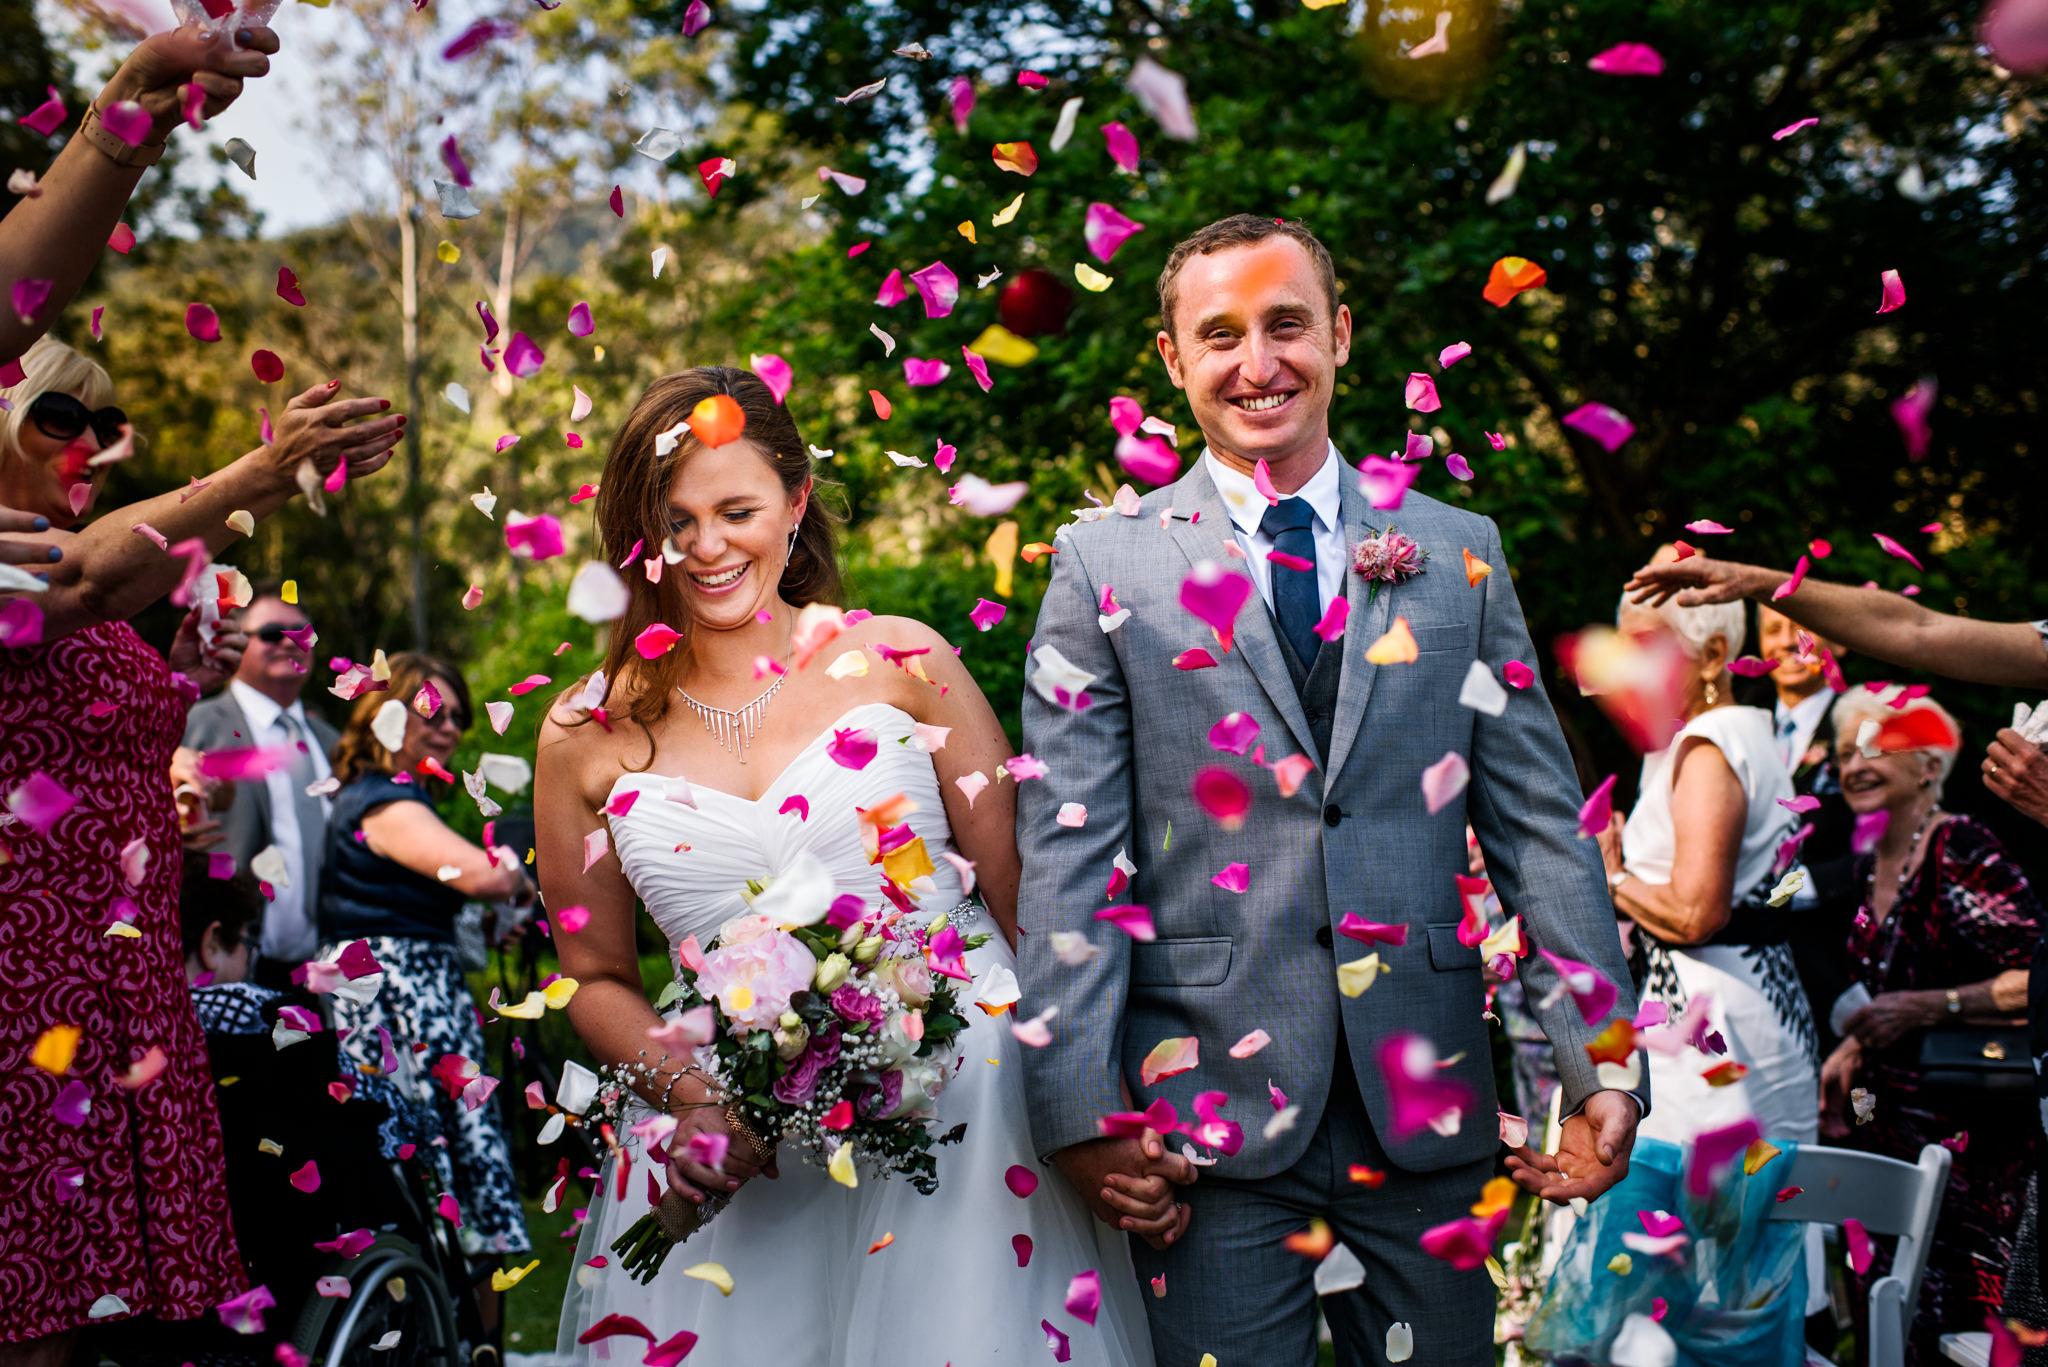 Rose petals thrown at newlyweds